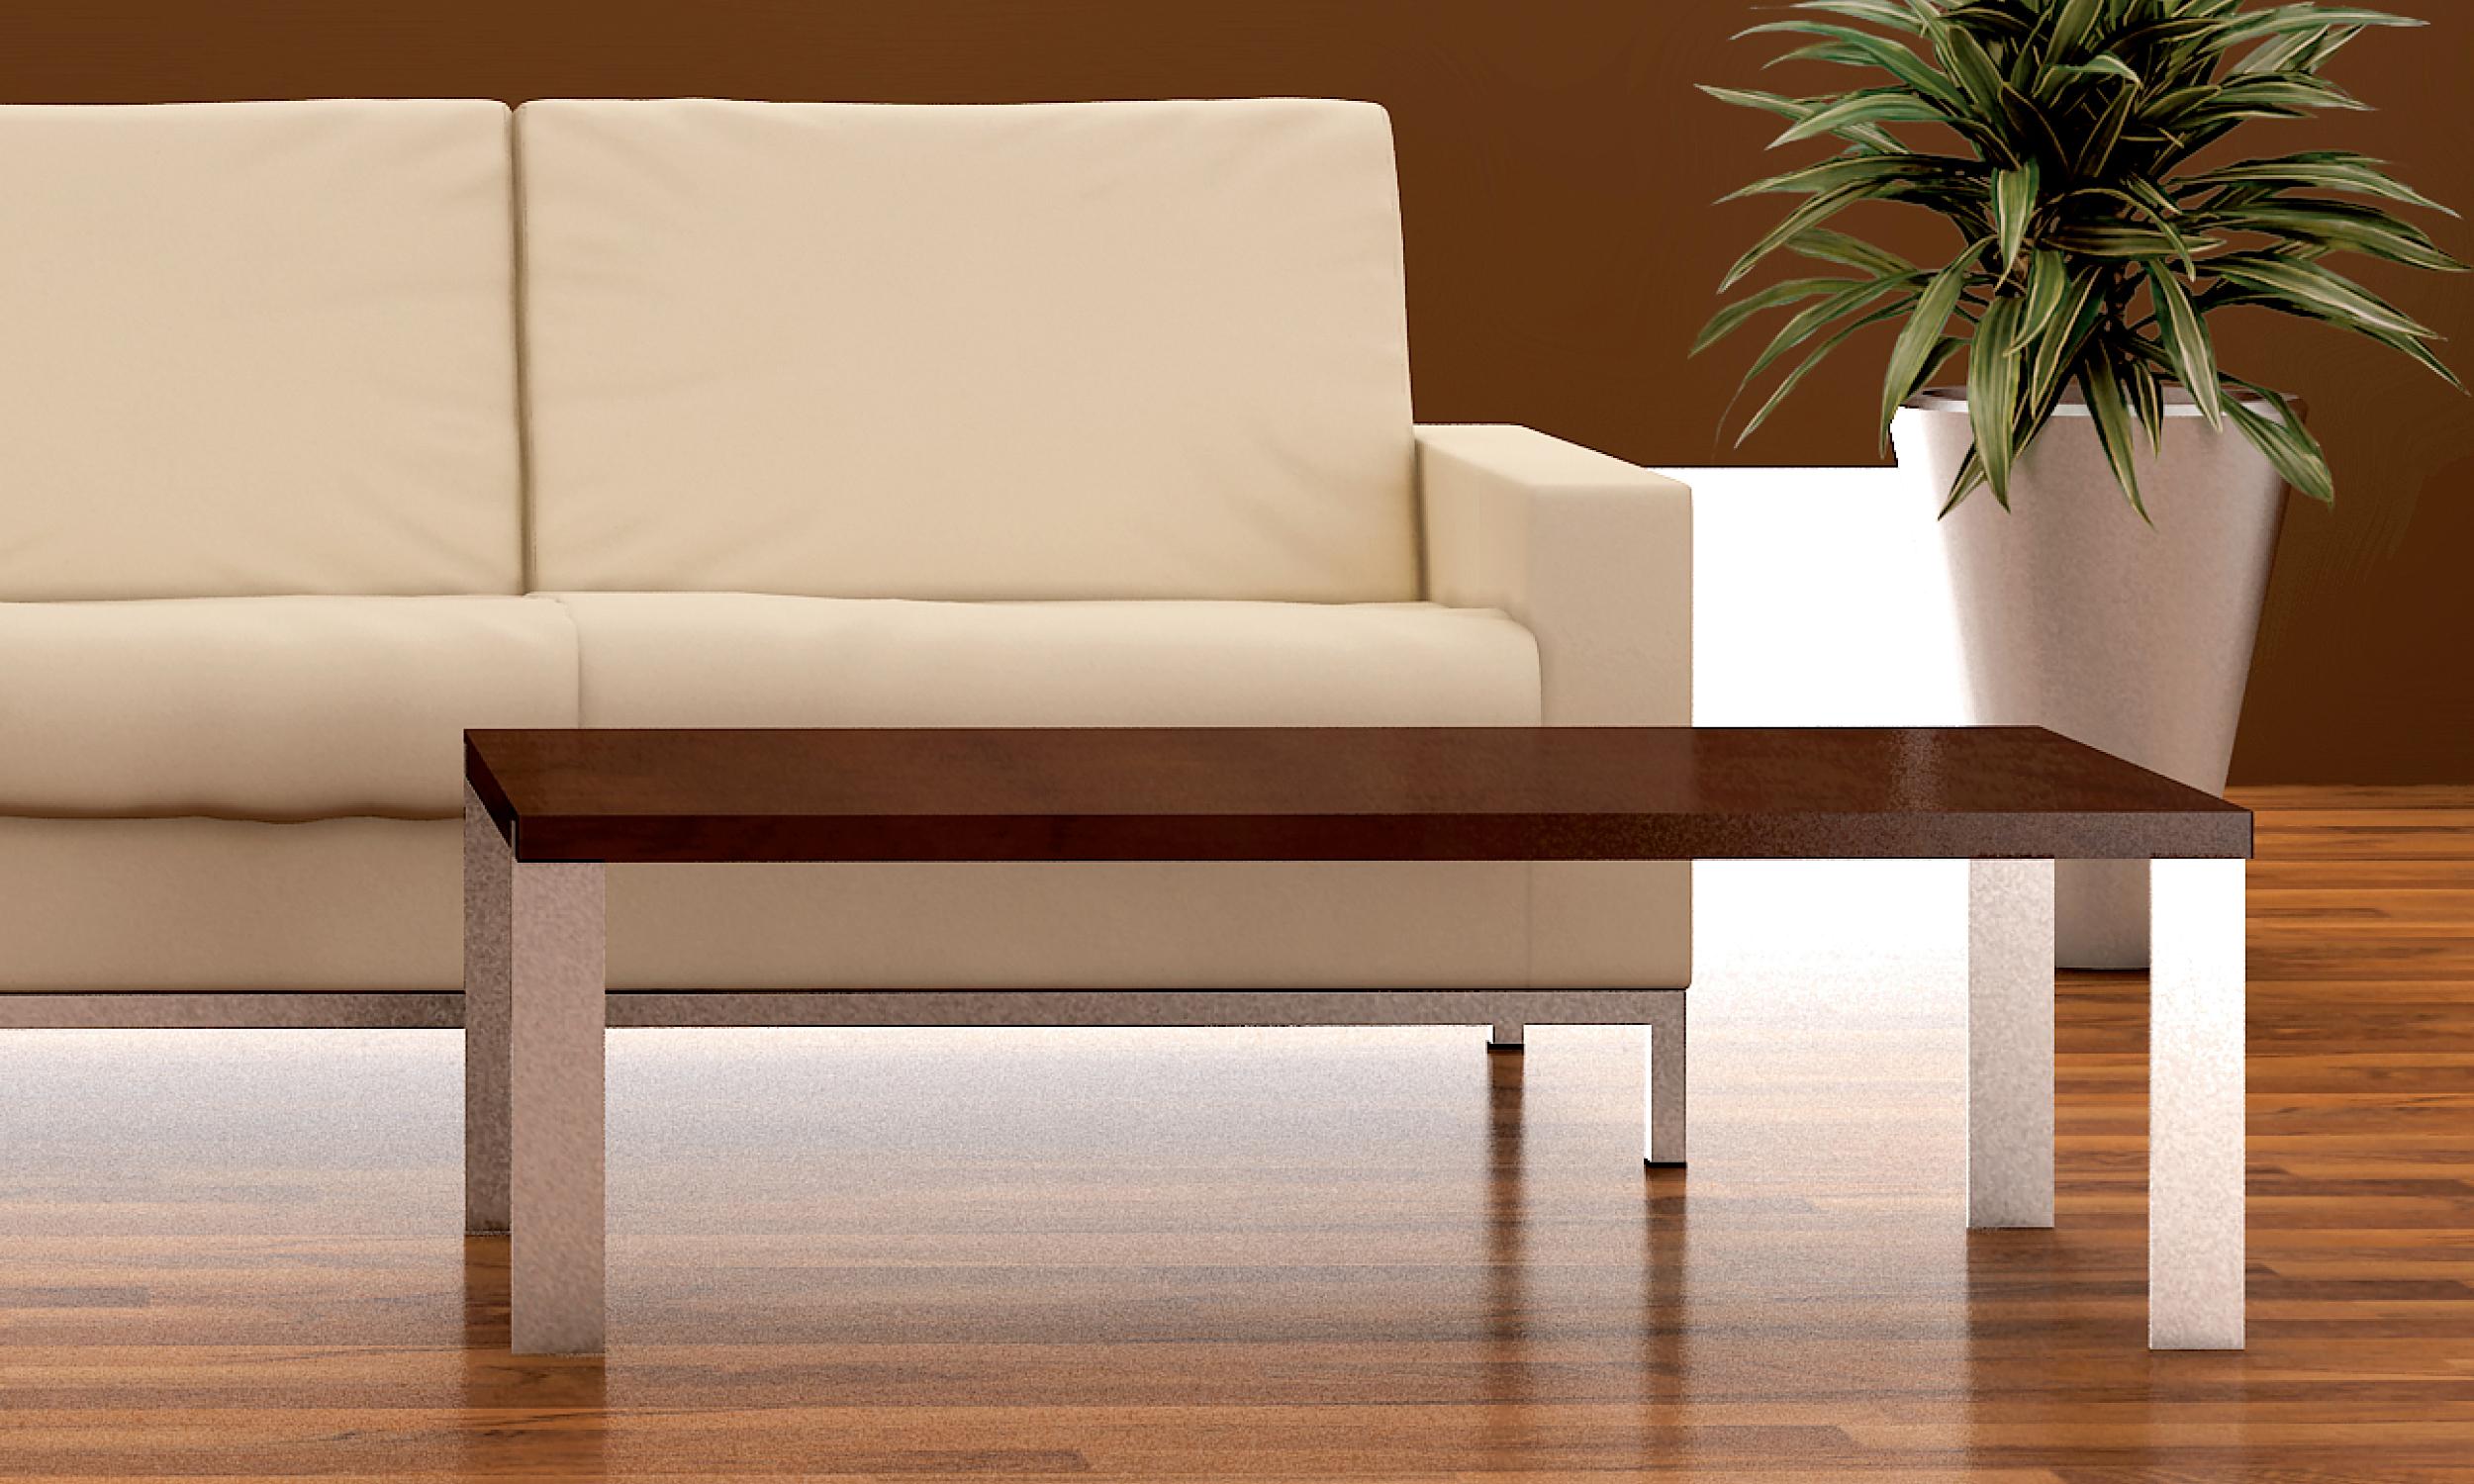 soft-seating_10-6_Concerto-3.jpg